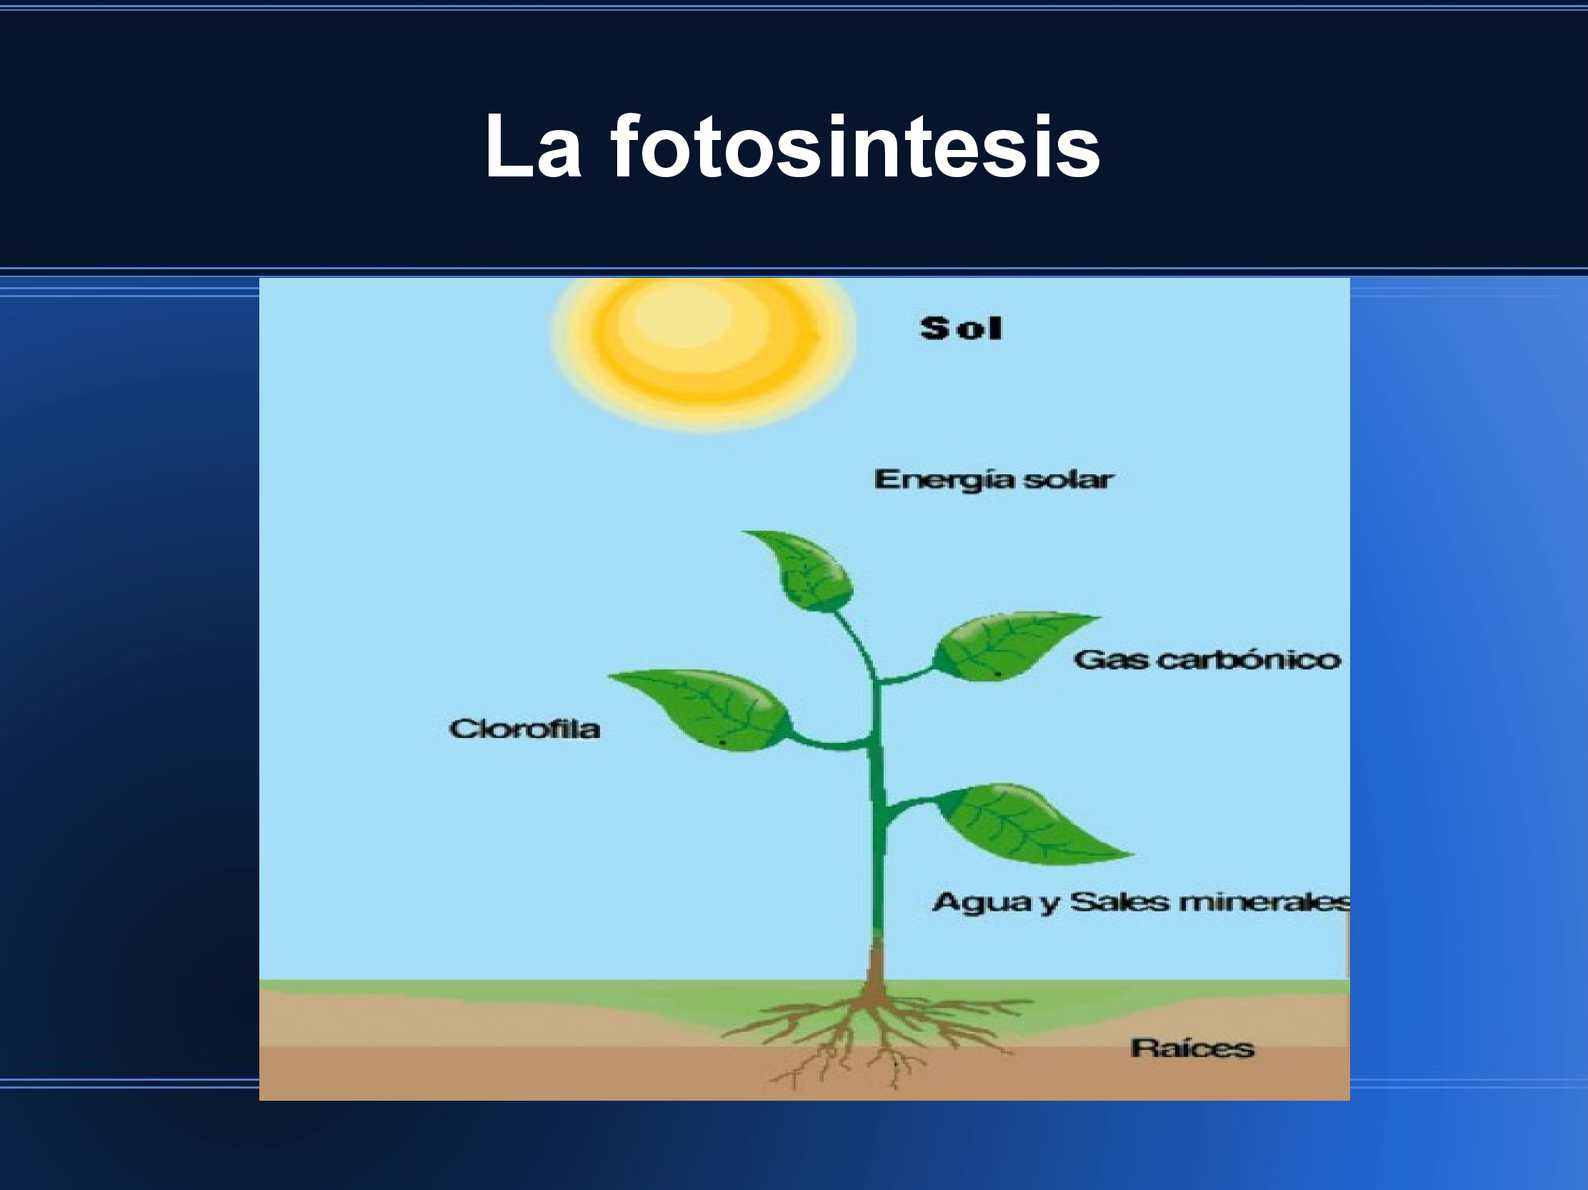 7 Penjelasan Perbedaan Fotosintesis dan Kemosintesis